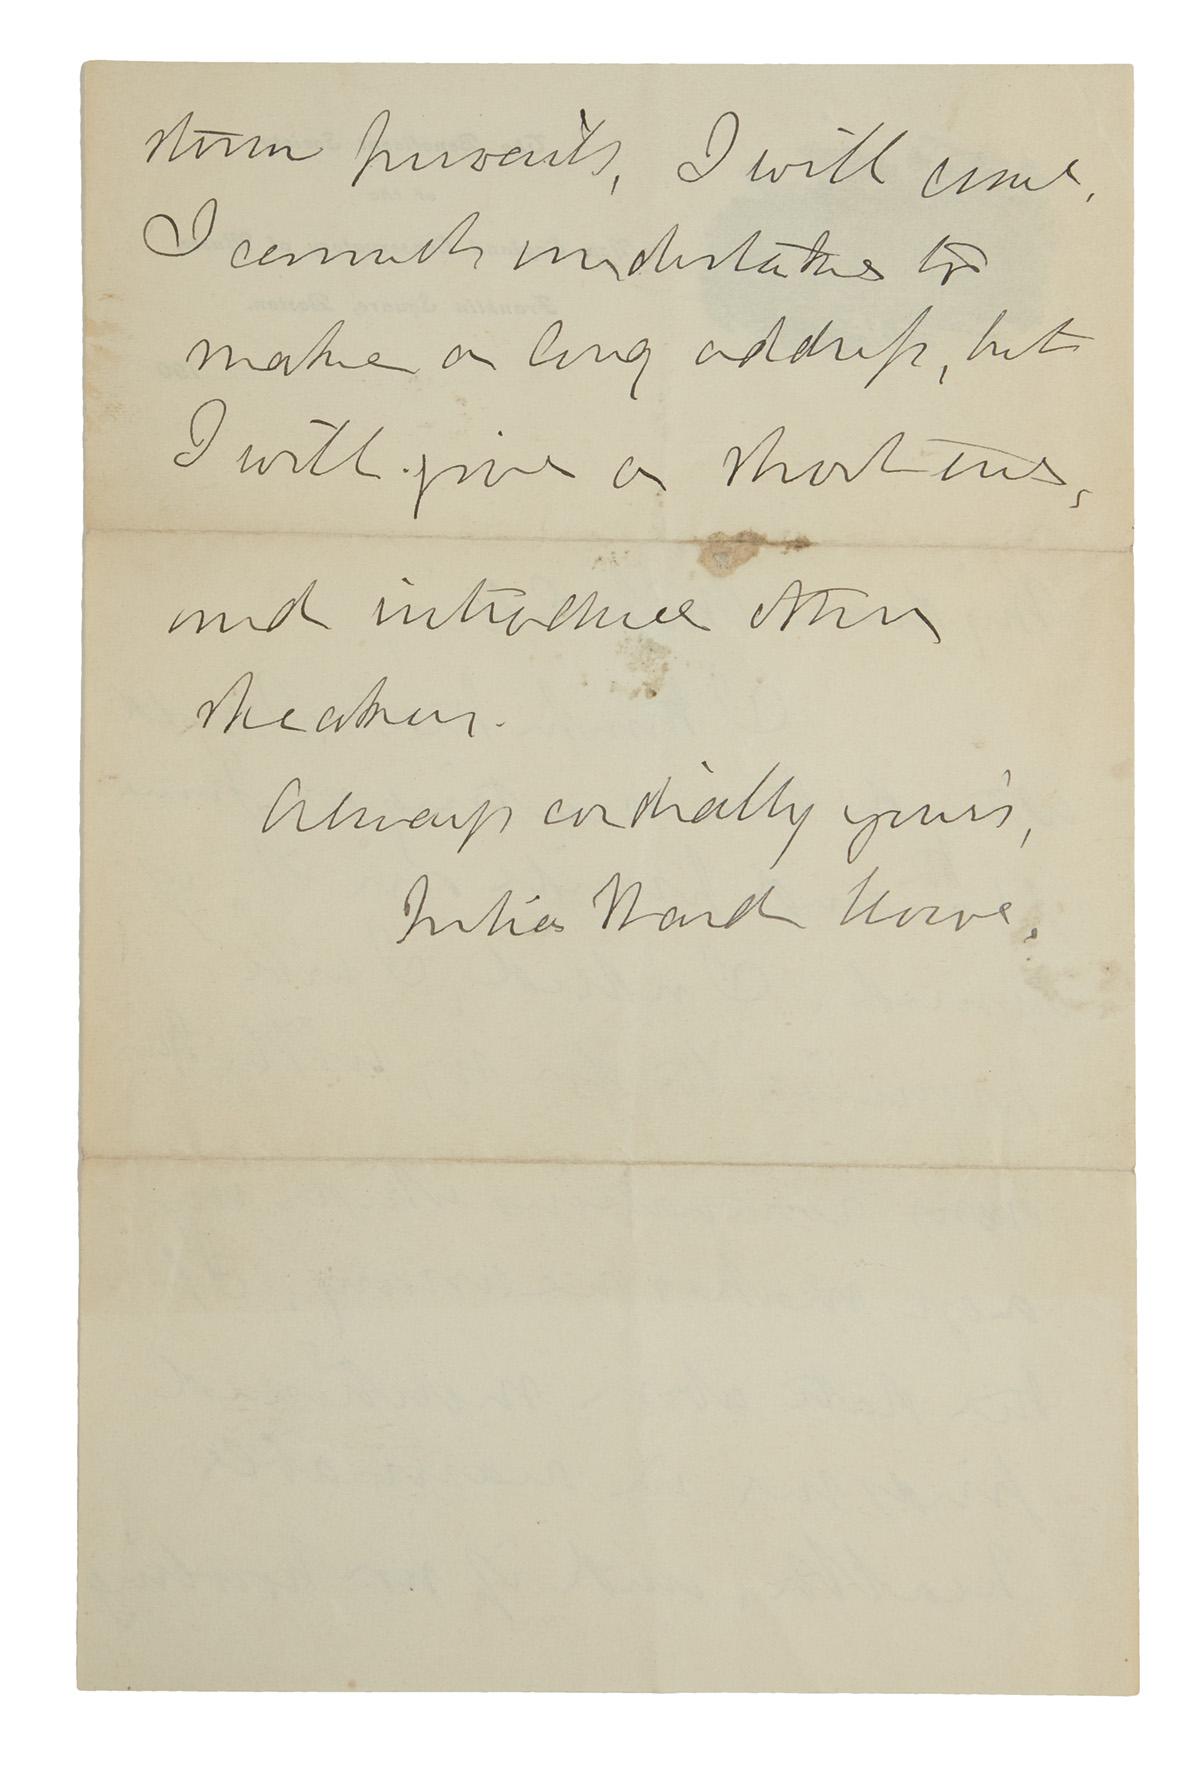 HOWE-JULIA-WARD-Autograph-Letter-Signed-to-My-dear-Miss-Elli